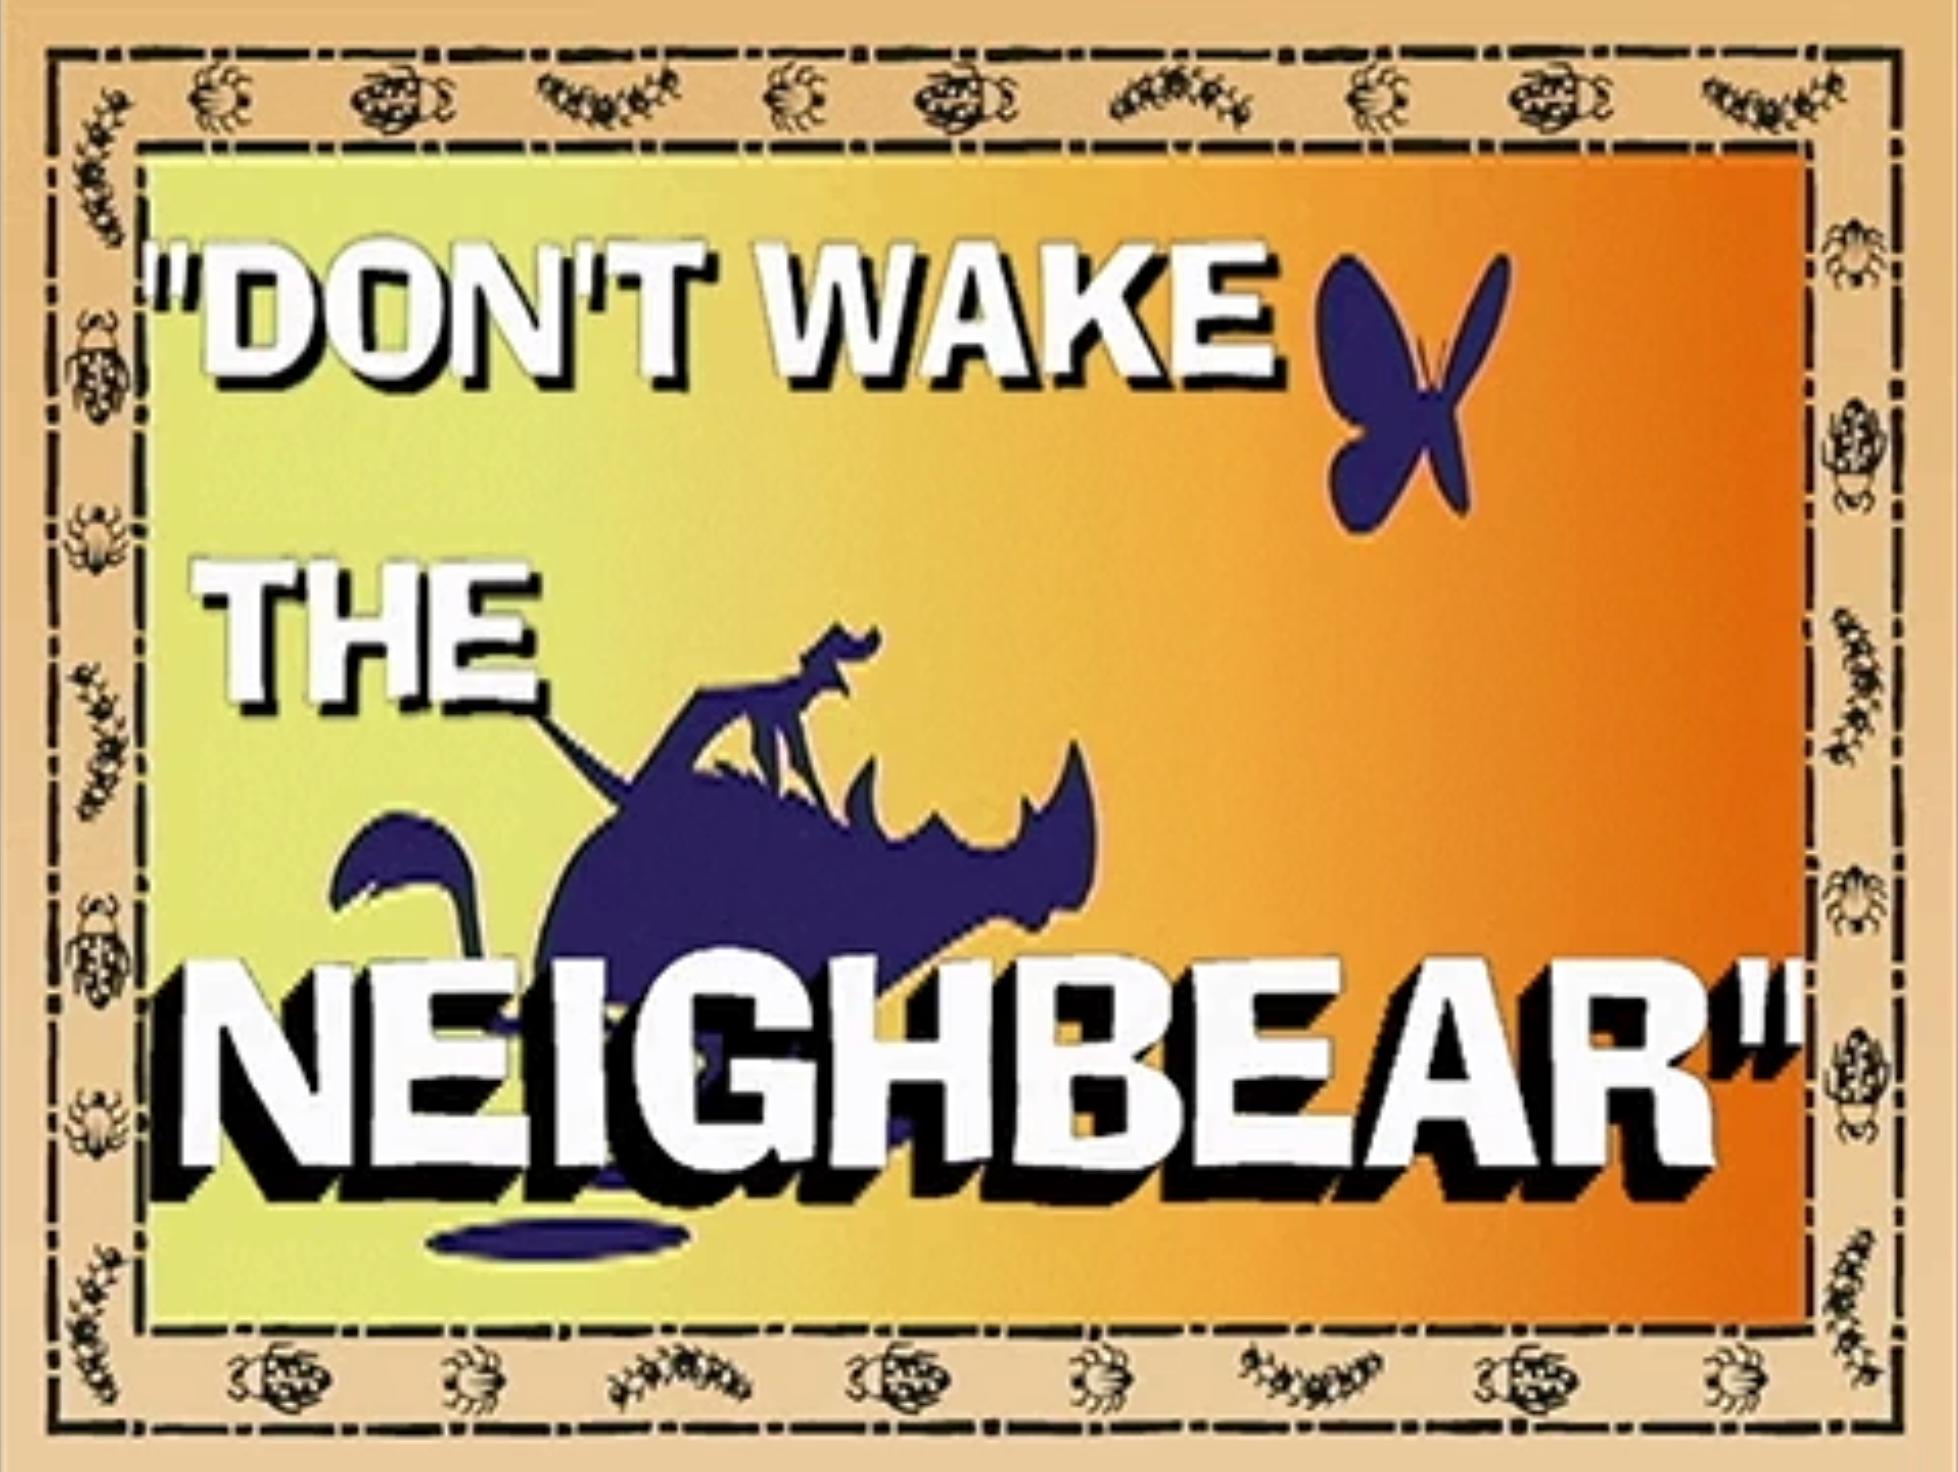 Don't Wake the Neighbear